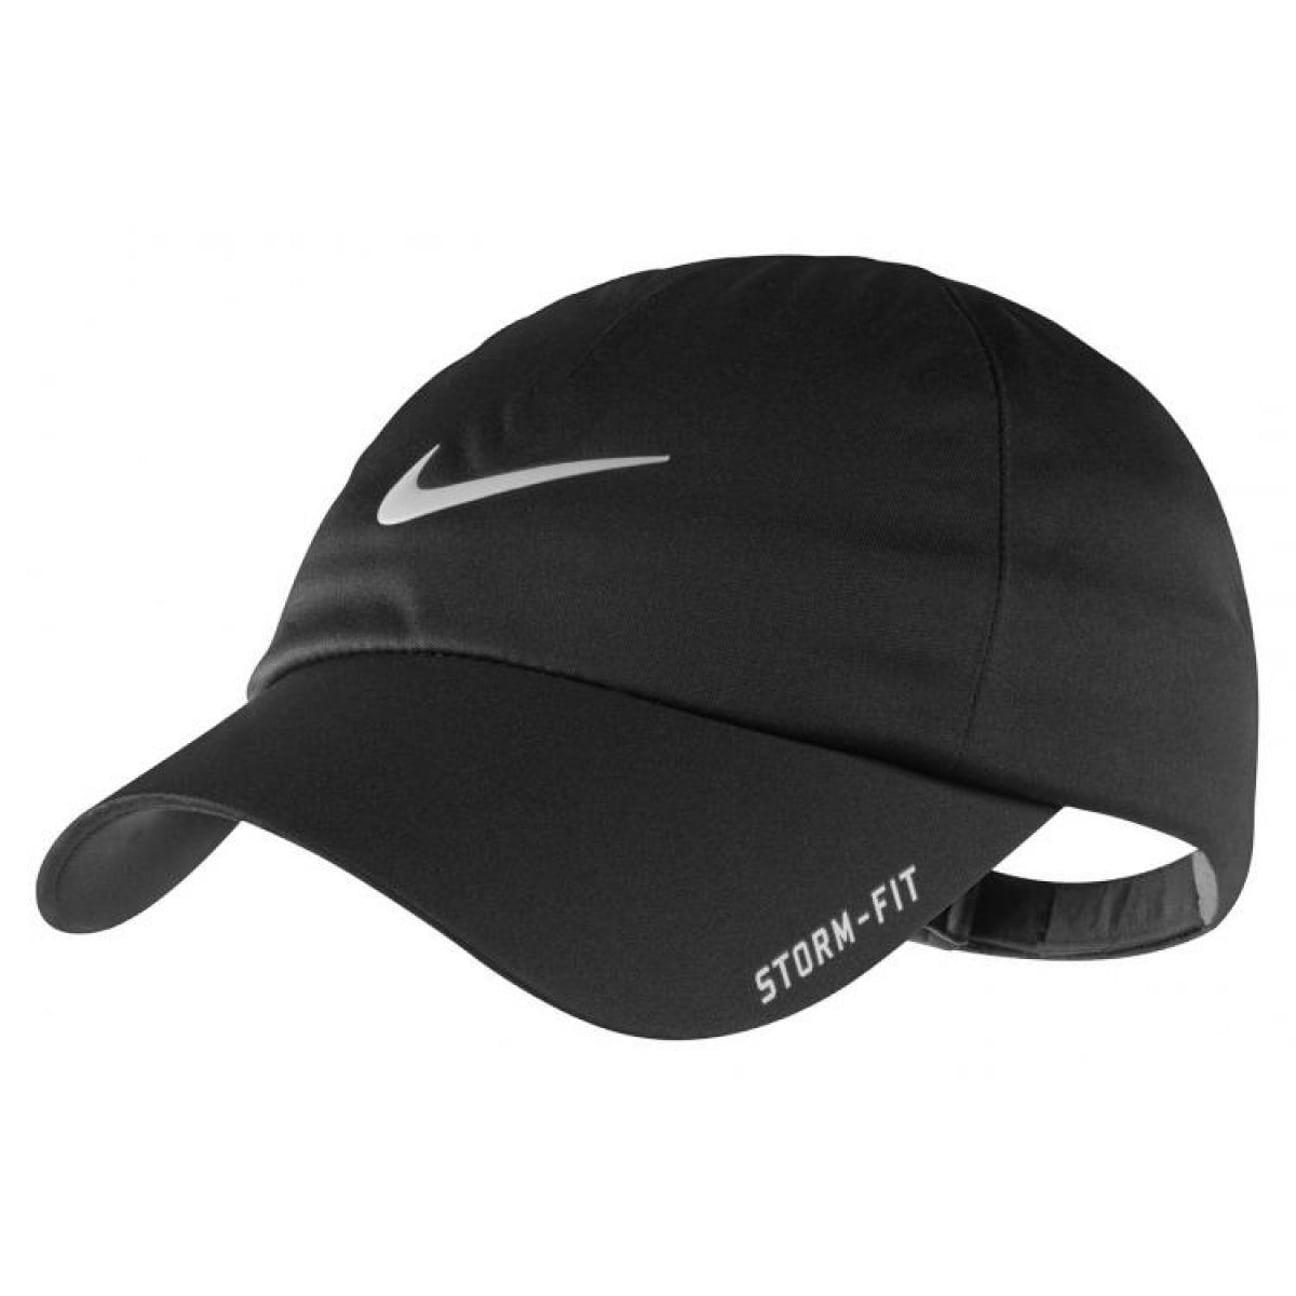 storm fit baseball cap by nike eur 29 95 hats caps. Black Bedroom Furniture Sets. Home Design Ideas